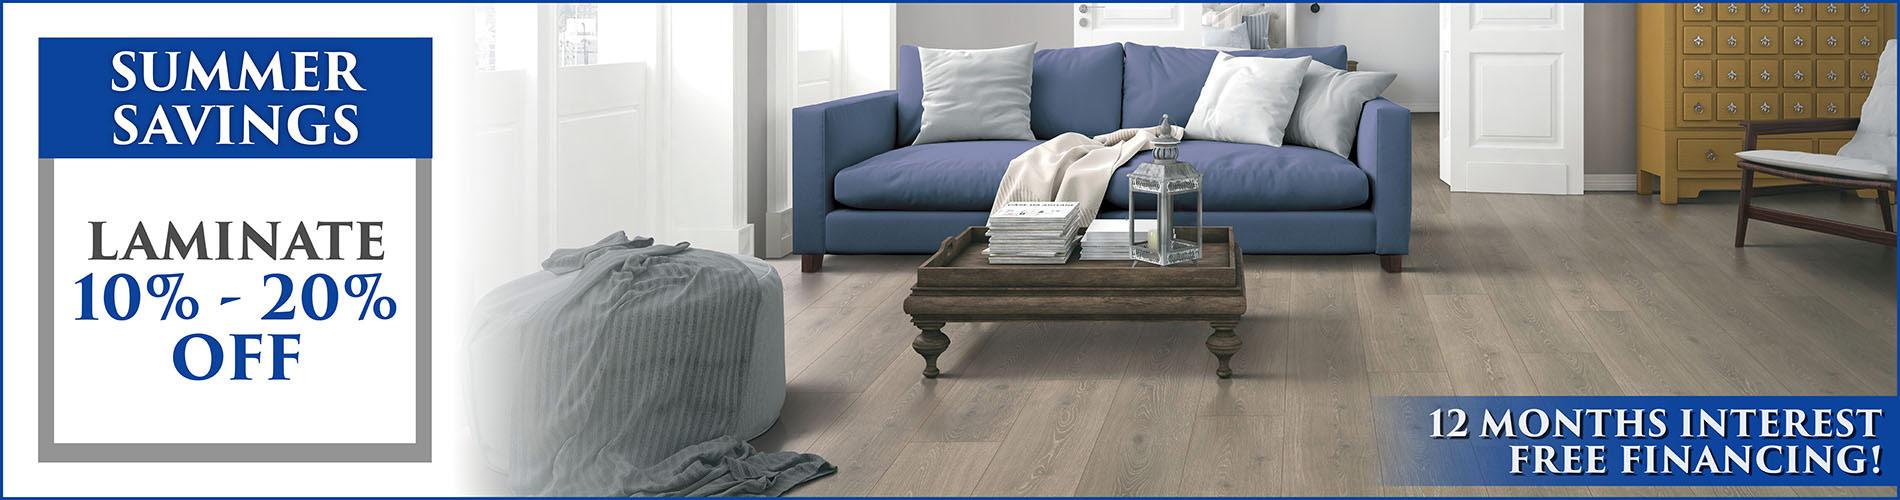 Take 10% - 20% off of laminate flooring during our Summer Savings!